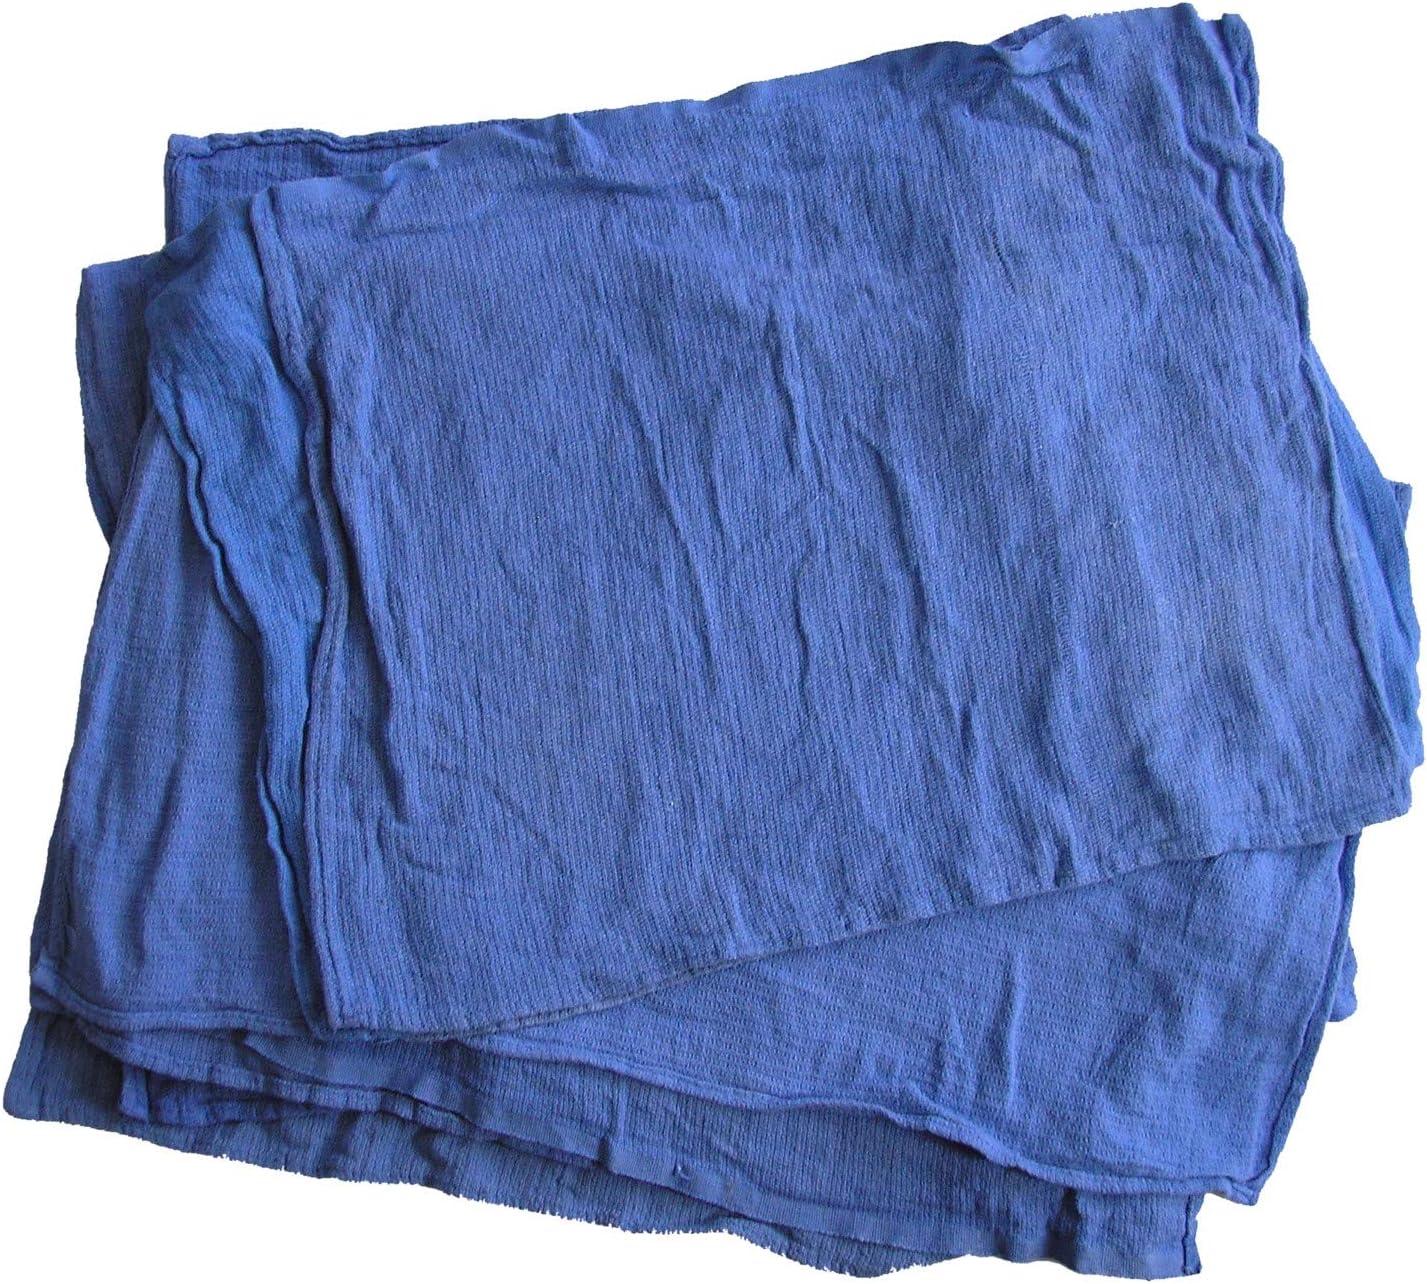 HI-TECH Blue Surgical Huck 再入荷 永遠の定番 予約販売 Towels 10 lb Box Reclaimed